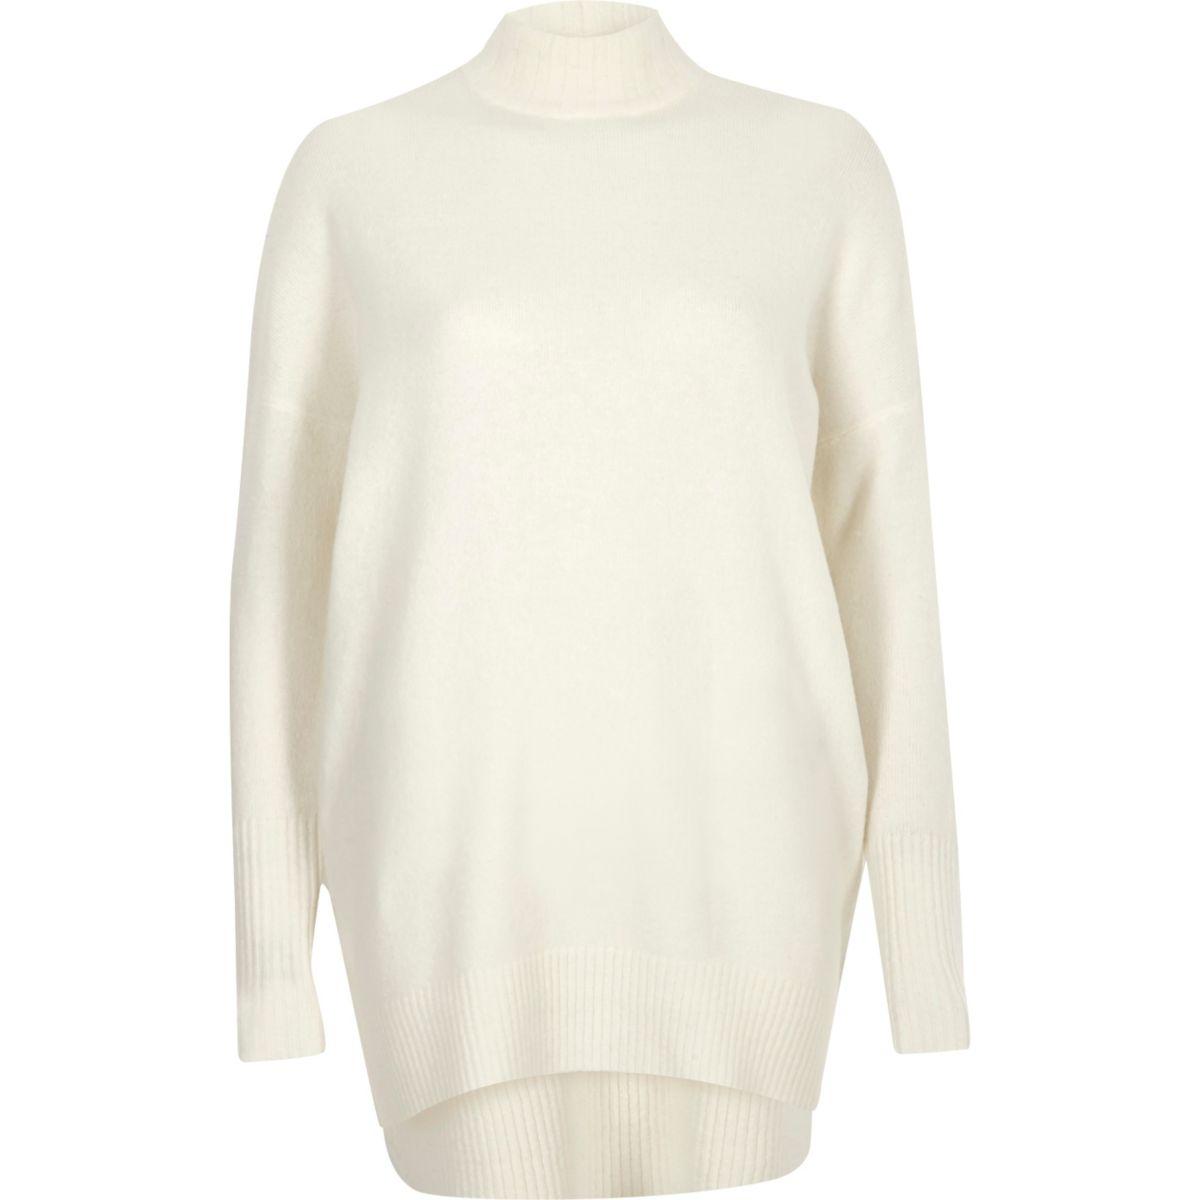 Cream oversized turtle neck sweater